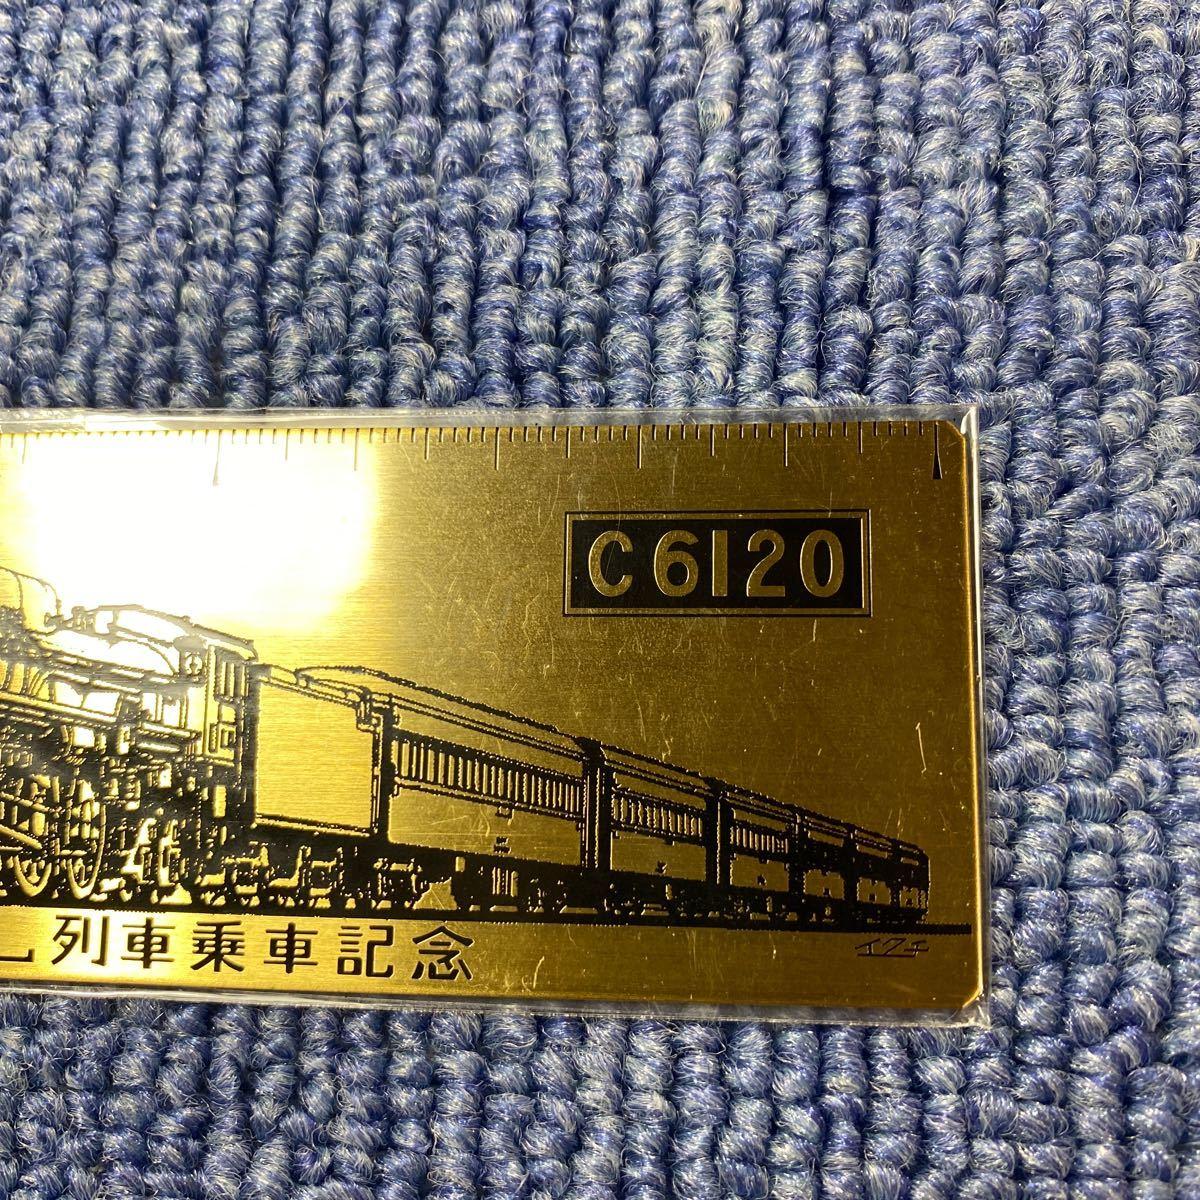 SL列車乗車記念 イクチ C6120 蒸気機関車 ゴールド 金属 定規 JR東日本承認 電車 鉄道グッズ コレクション レア 未使用_画像5